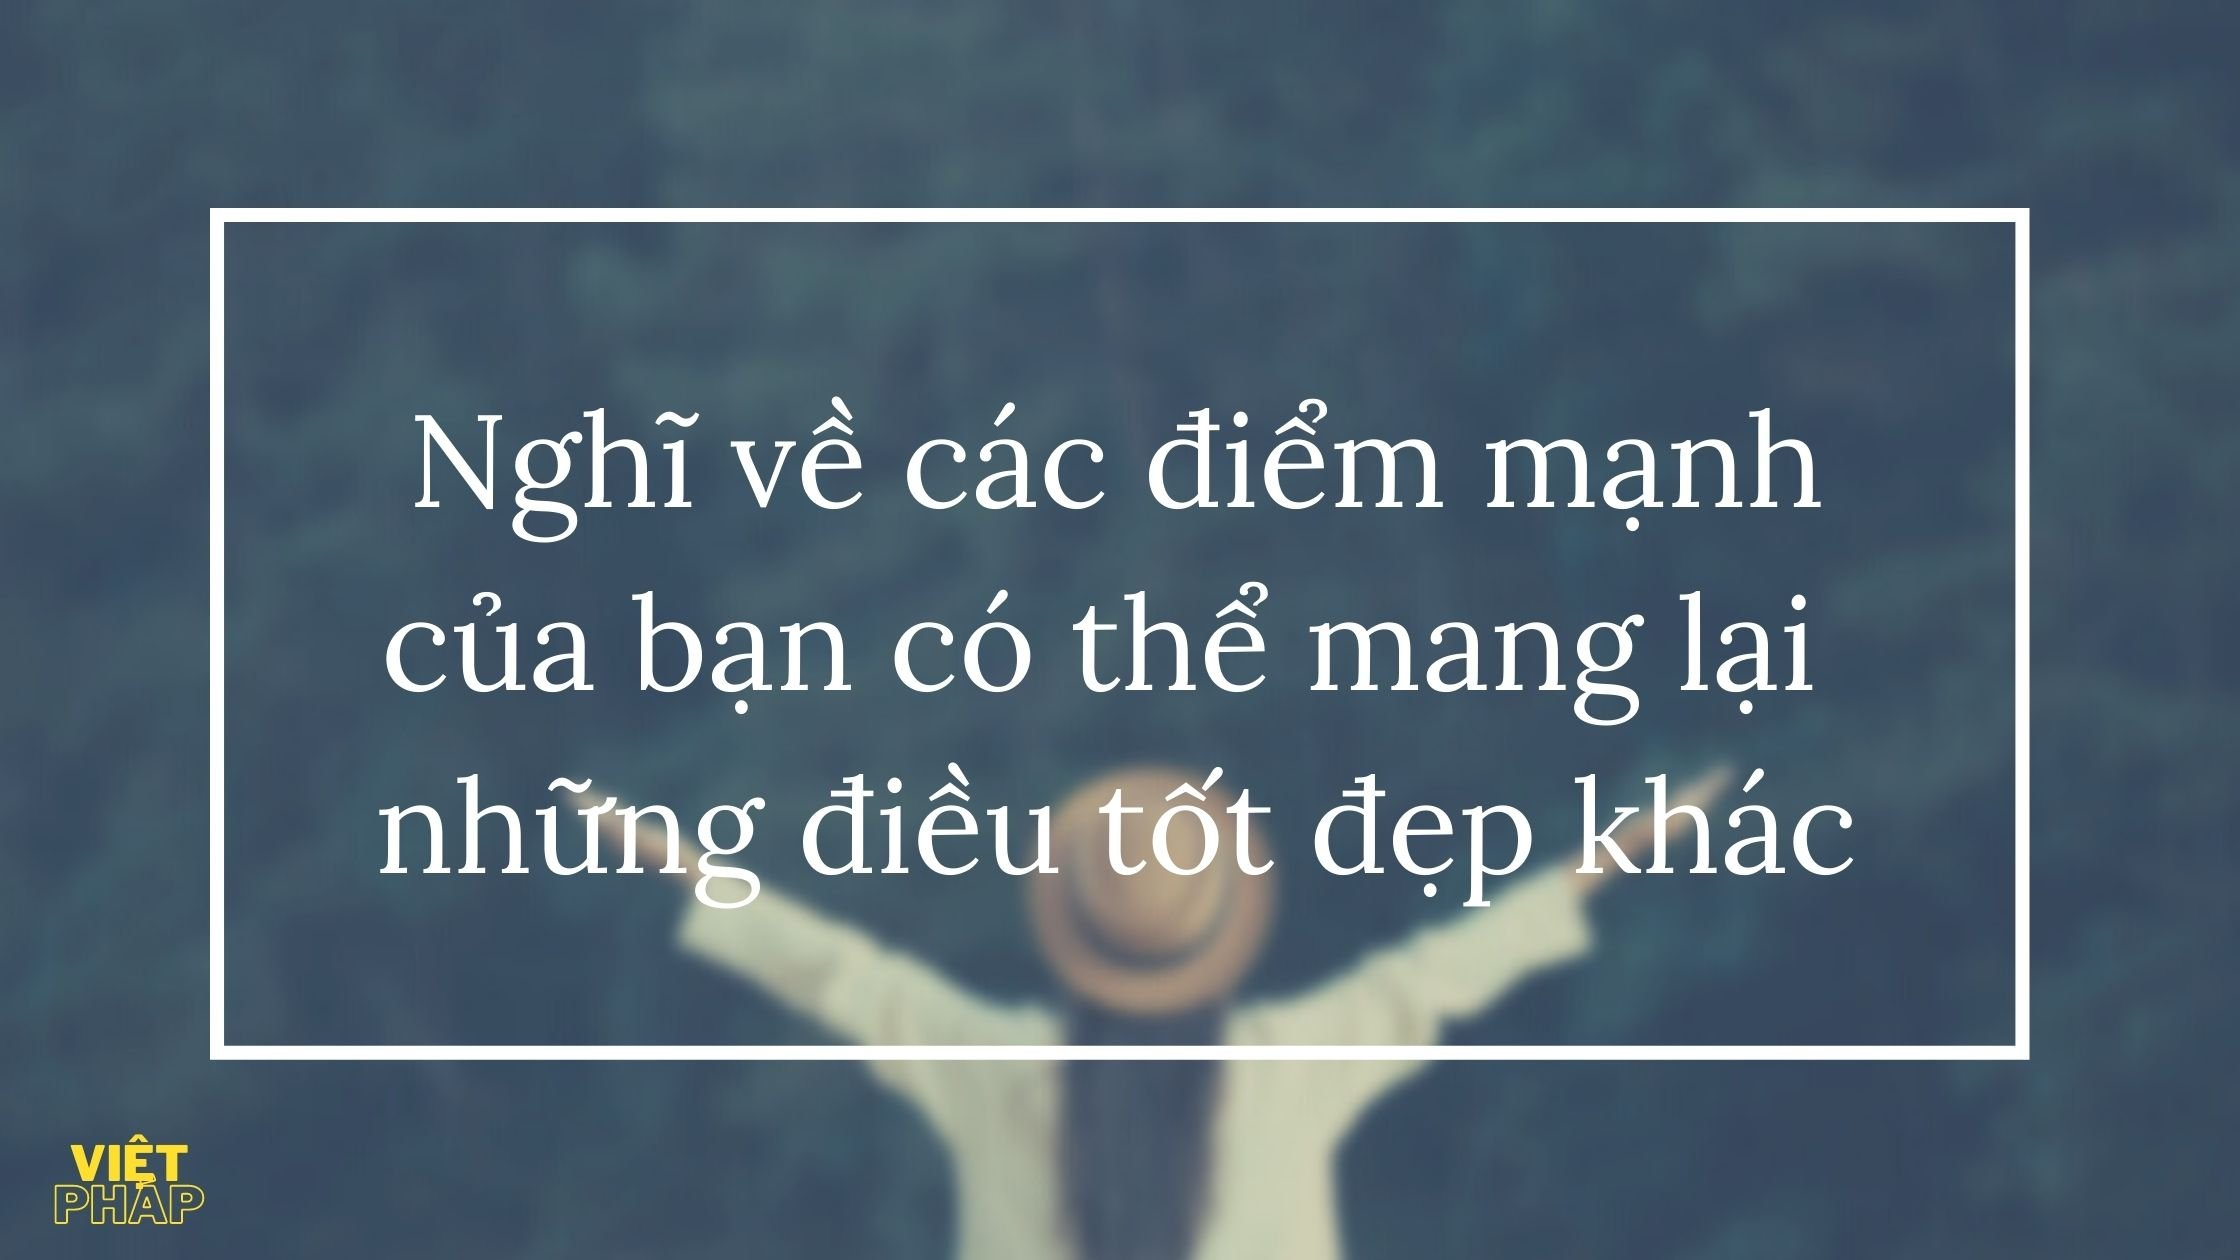 nghi_ve_diem_manh_cua_ban_than-